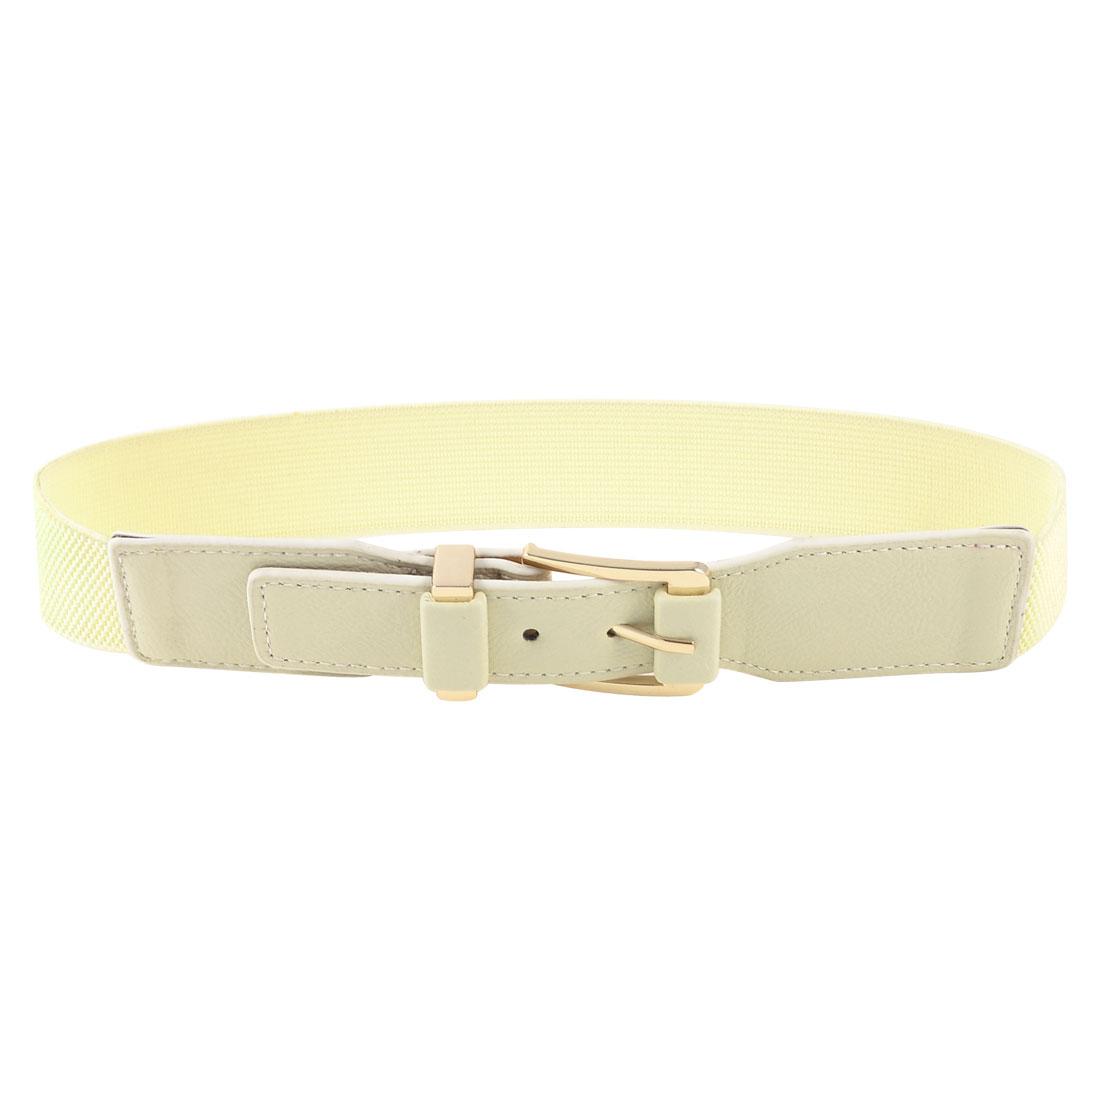 Gold Tone Metallic Single Prong Buckle Beige Cinch Belt for Ladies